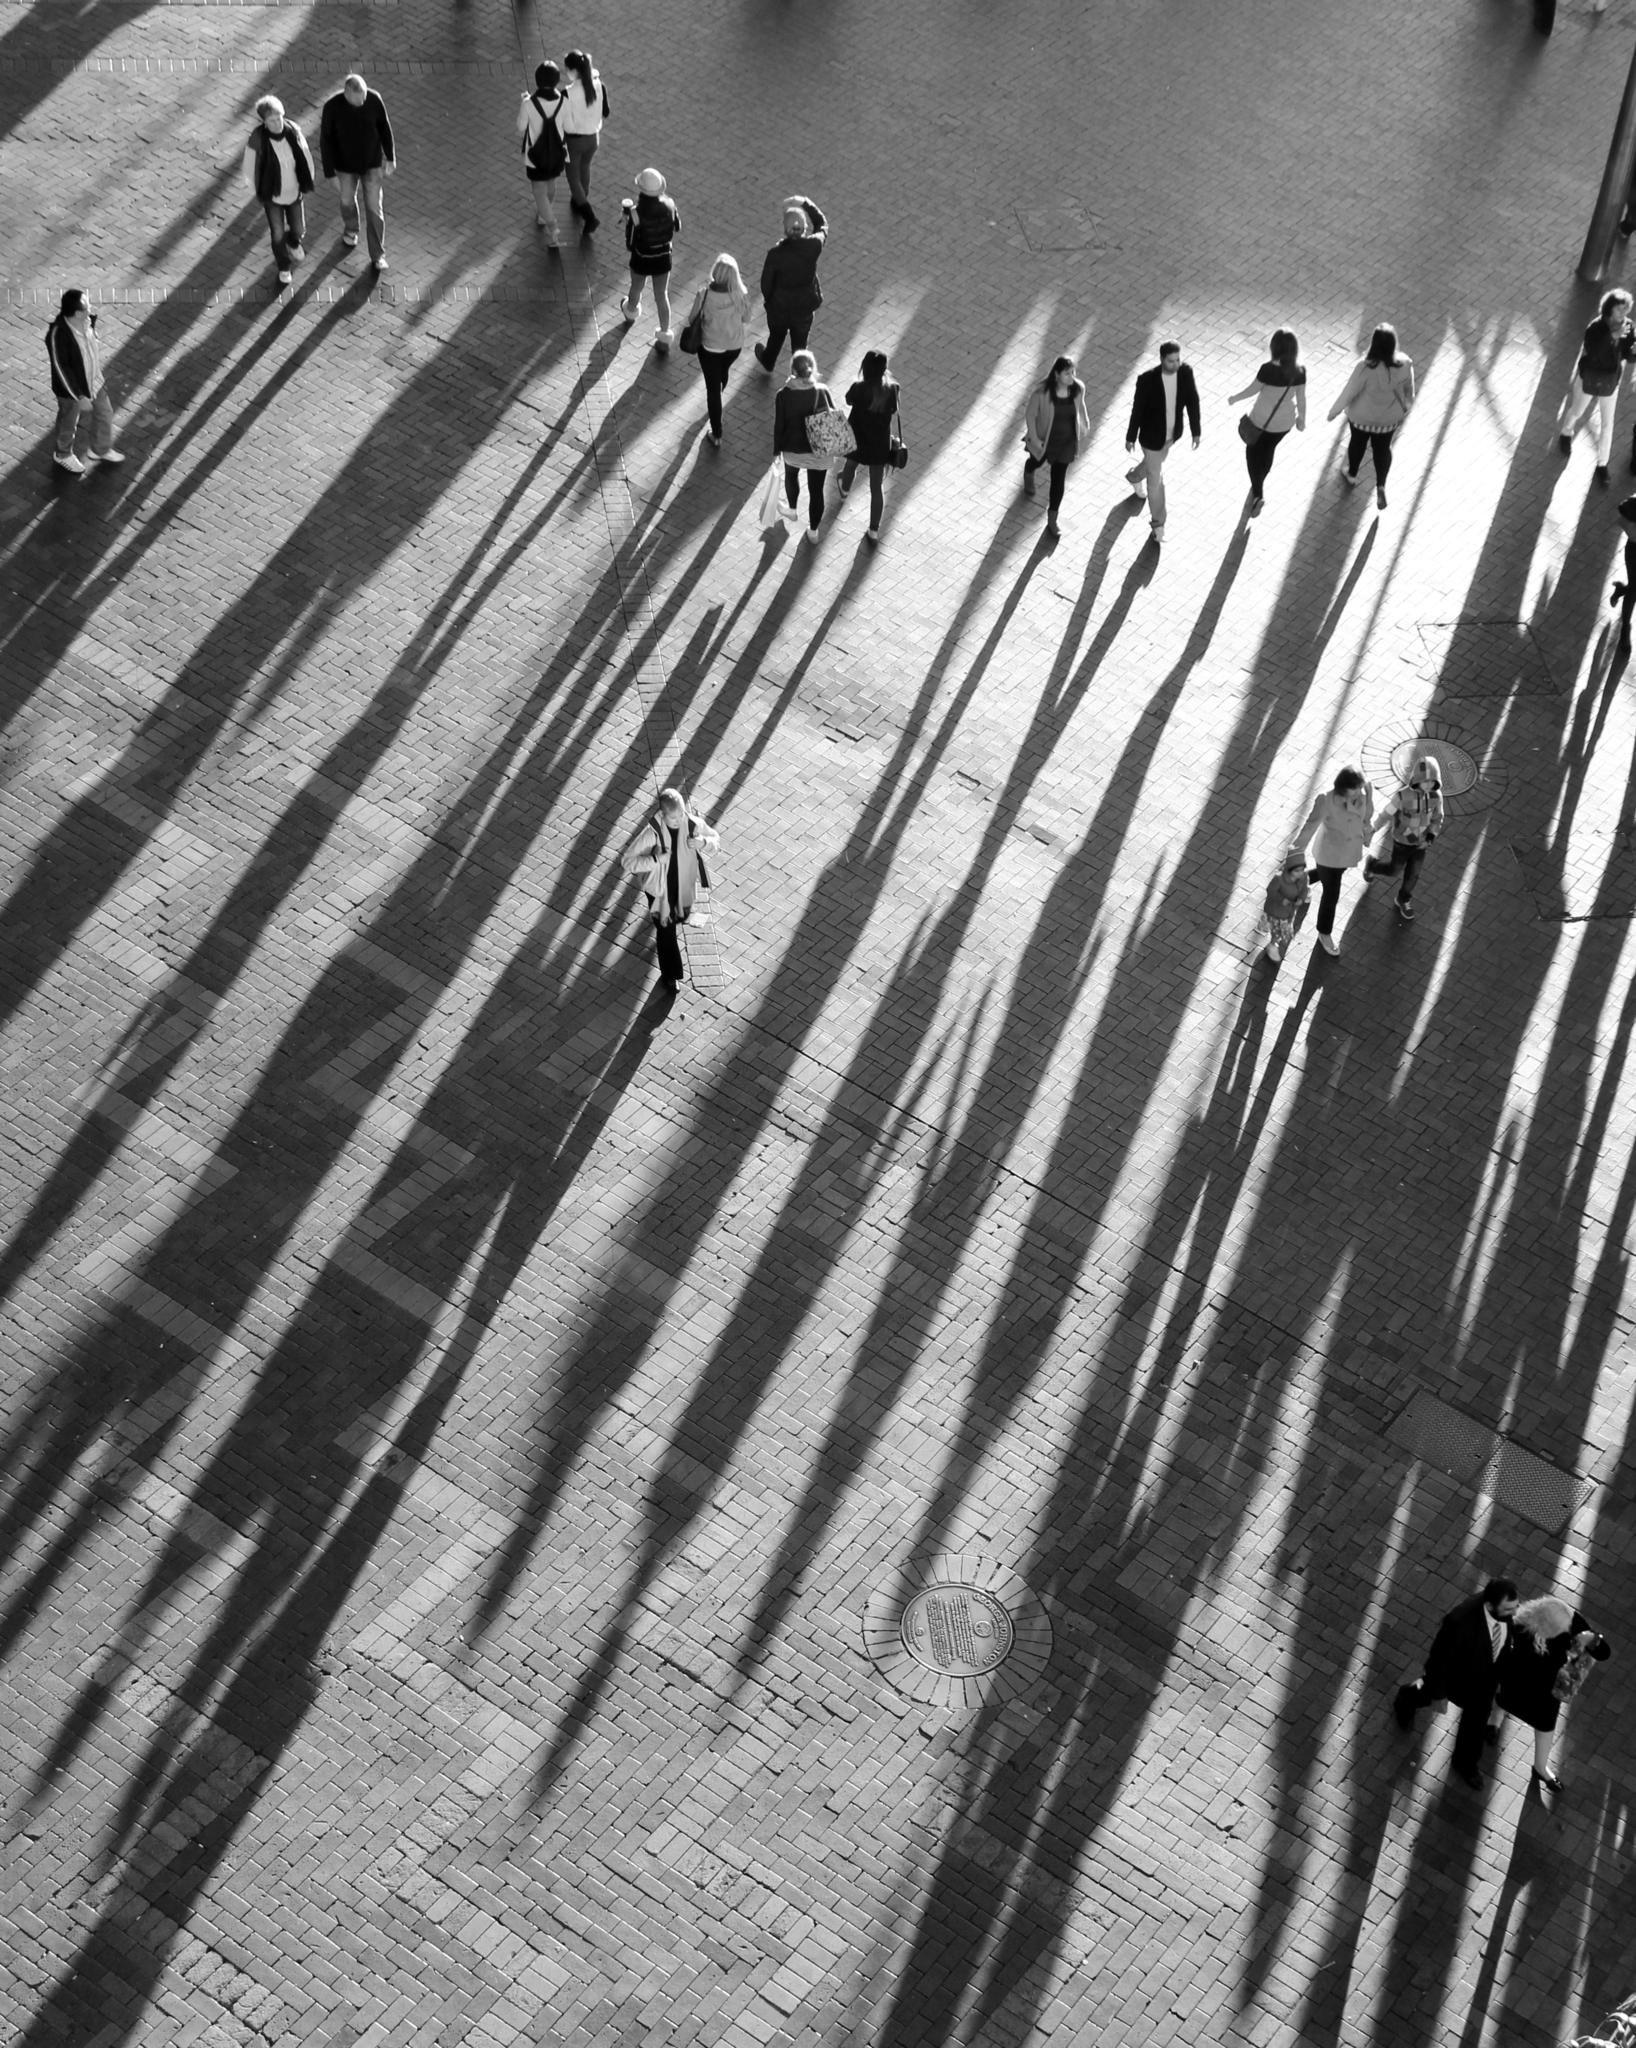 Long Shadows by Richard Heersmink on 500px